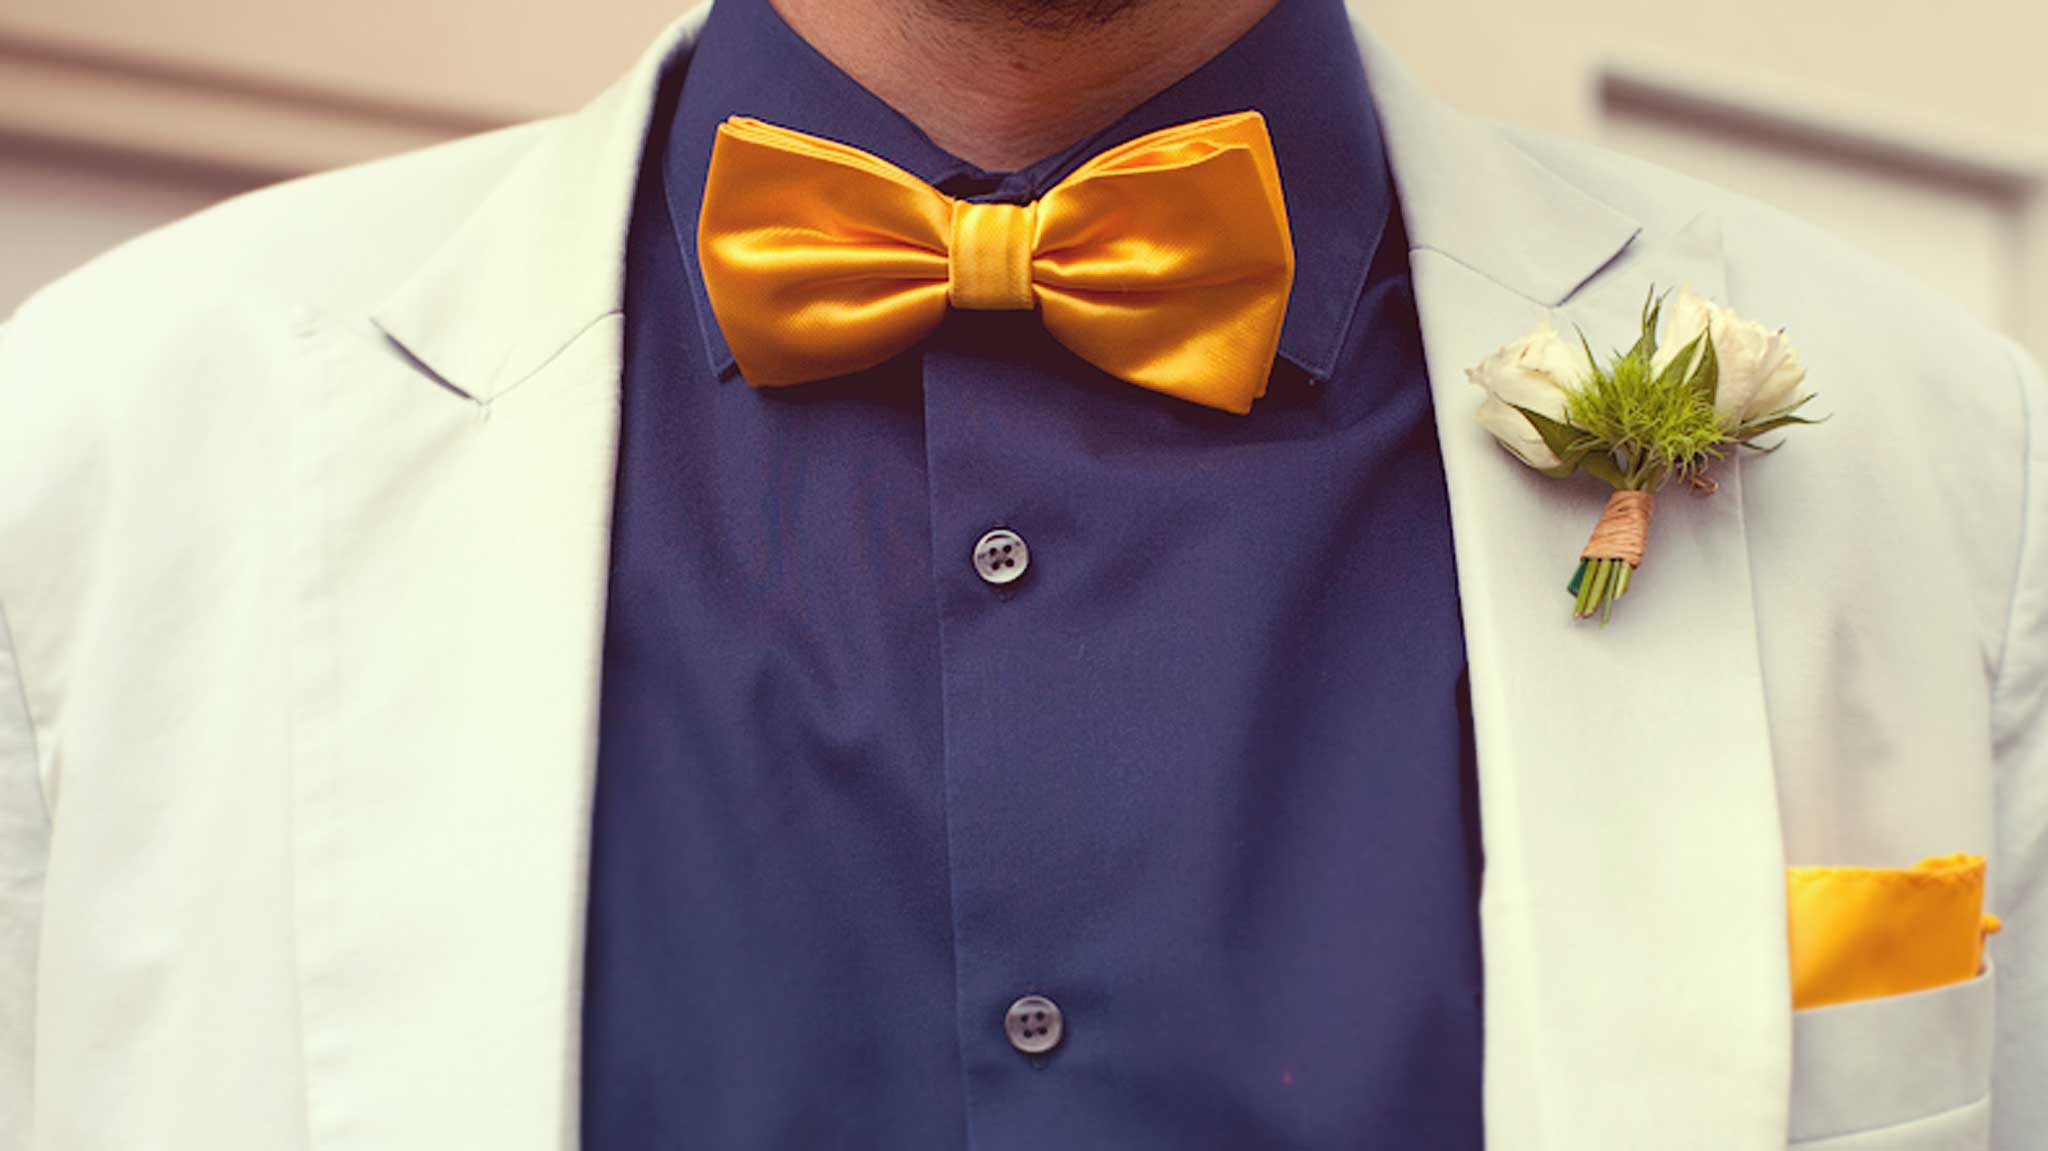 detail-gentle-studio-photographe-mariage-costume-groom-vinatge-yellow-tie-noeud-papillon-jaune